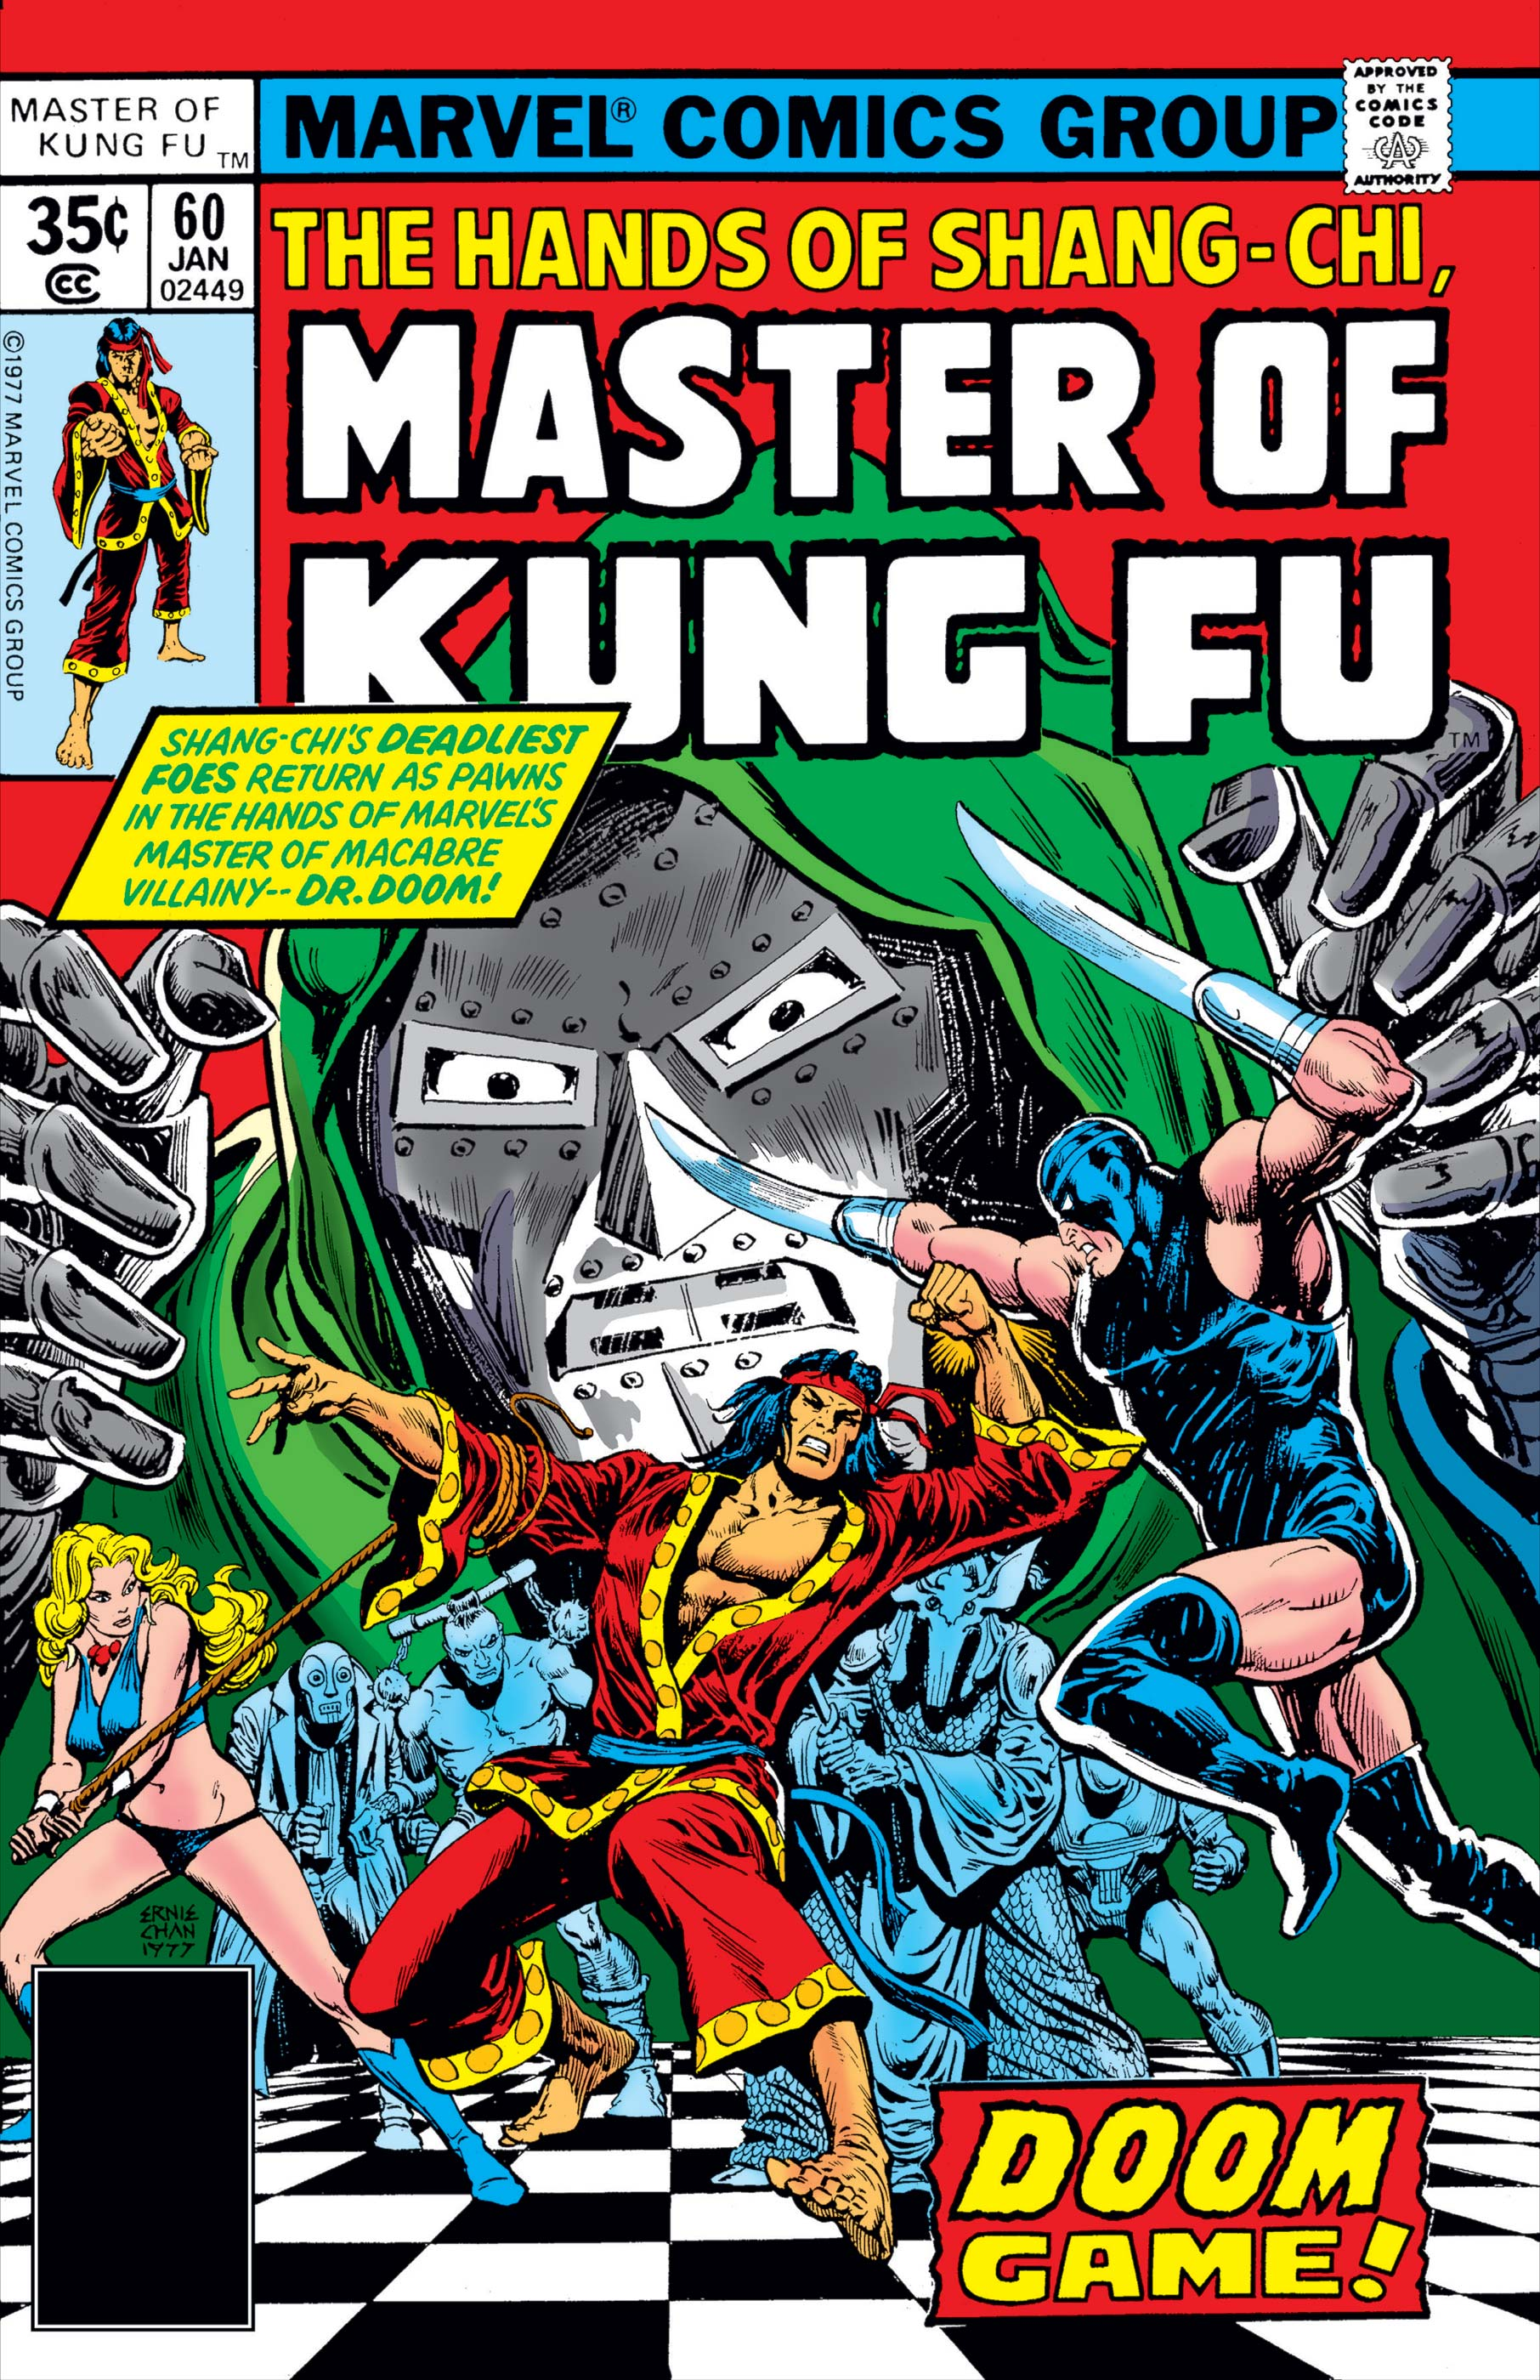 Master of Kung Fu (1974) #60